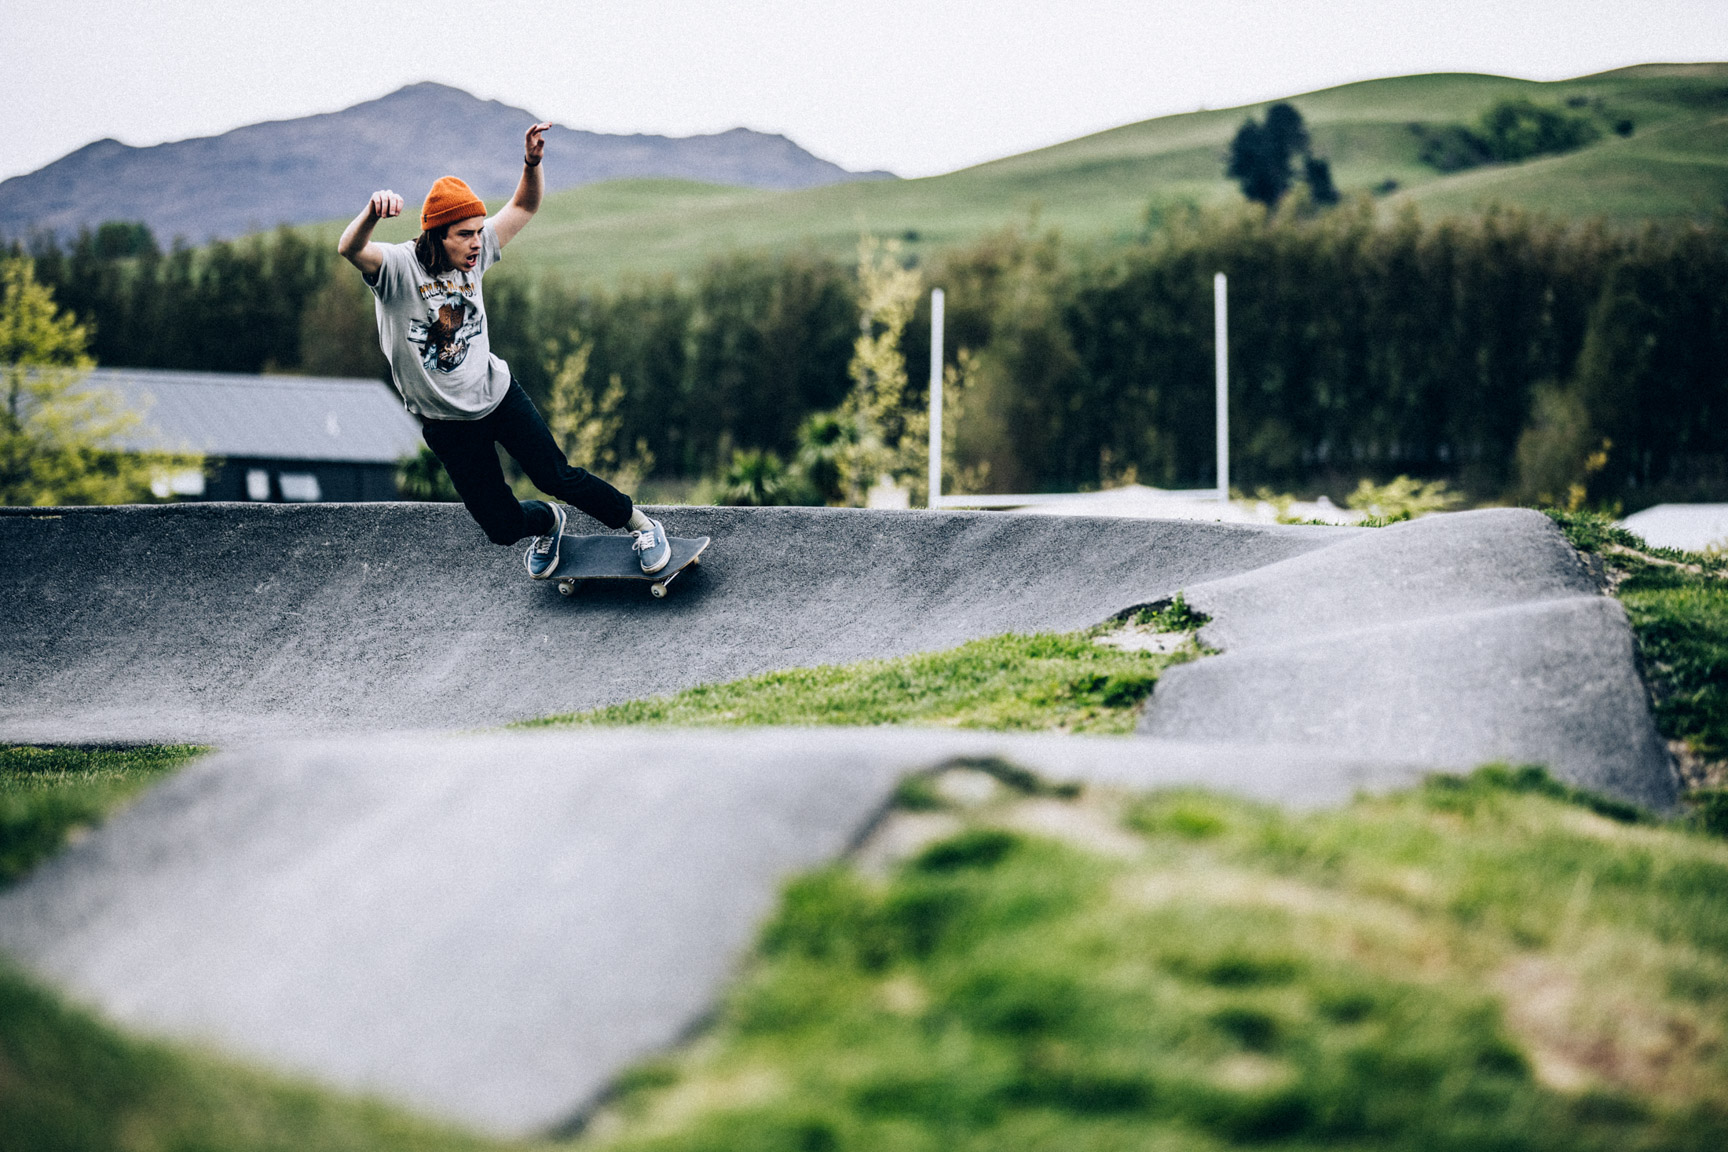 Jordan Lovelis, New Zealand